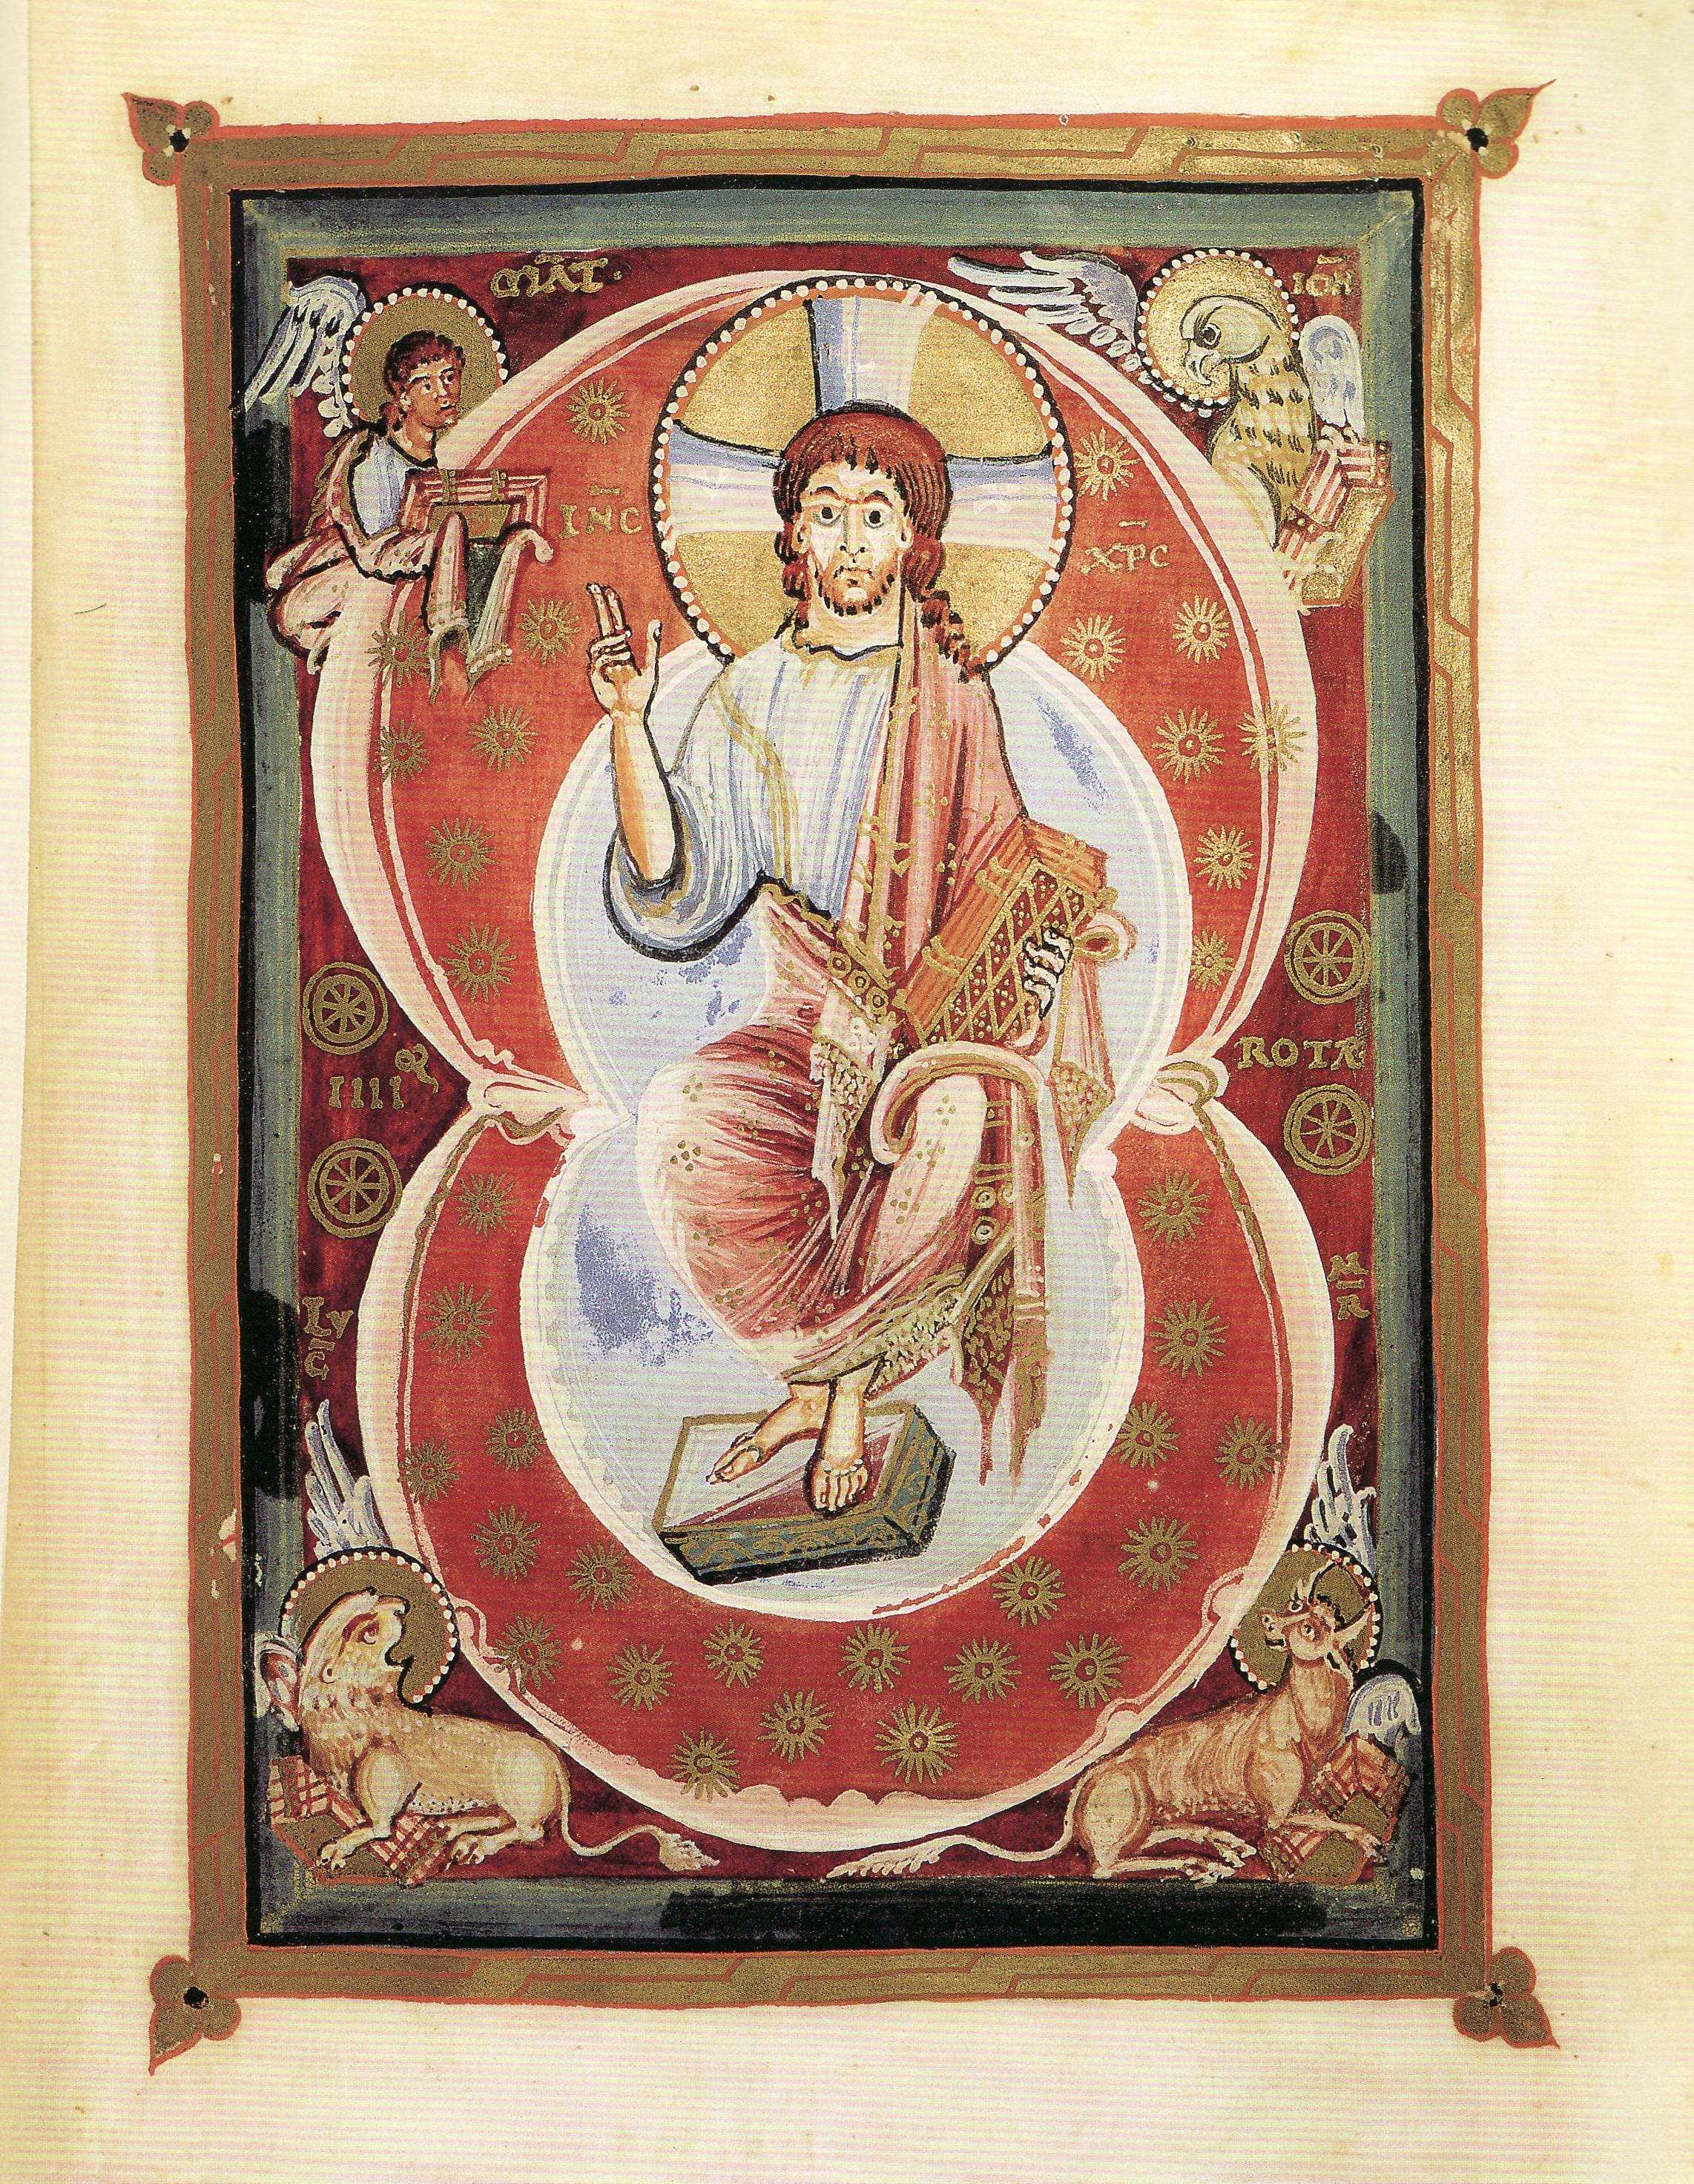 http://sacramysteria.blogspot.fr/2015/04/temps-pascal.html